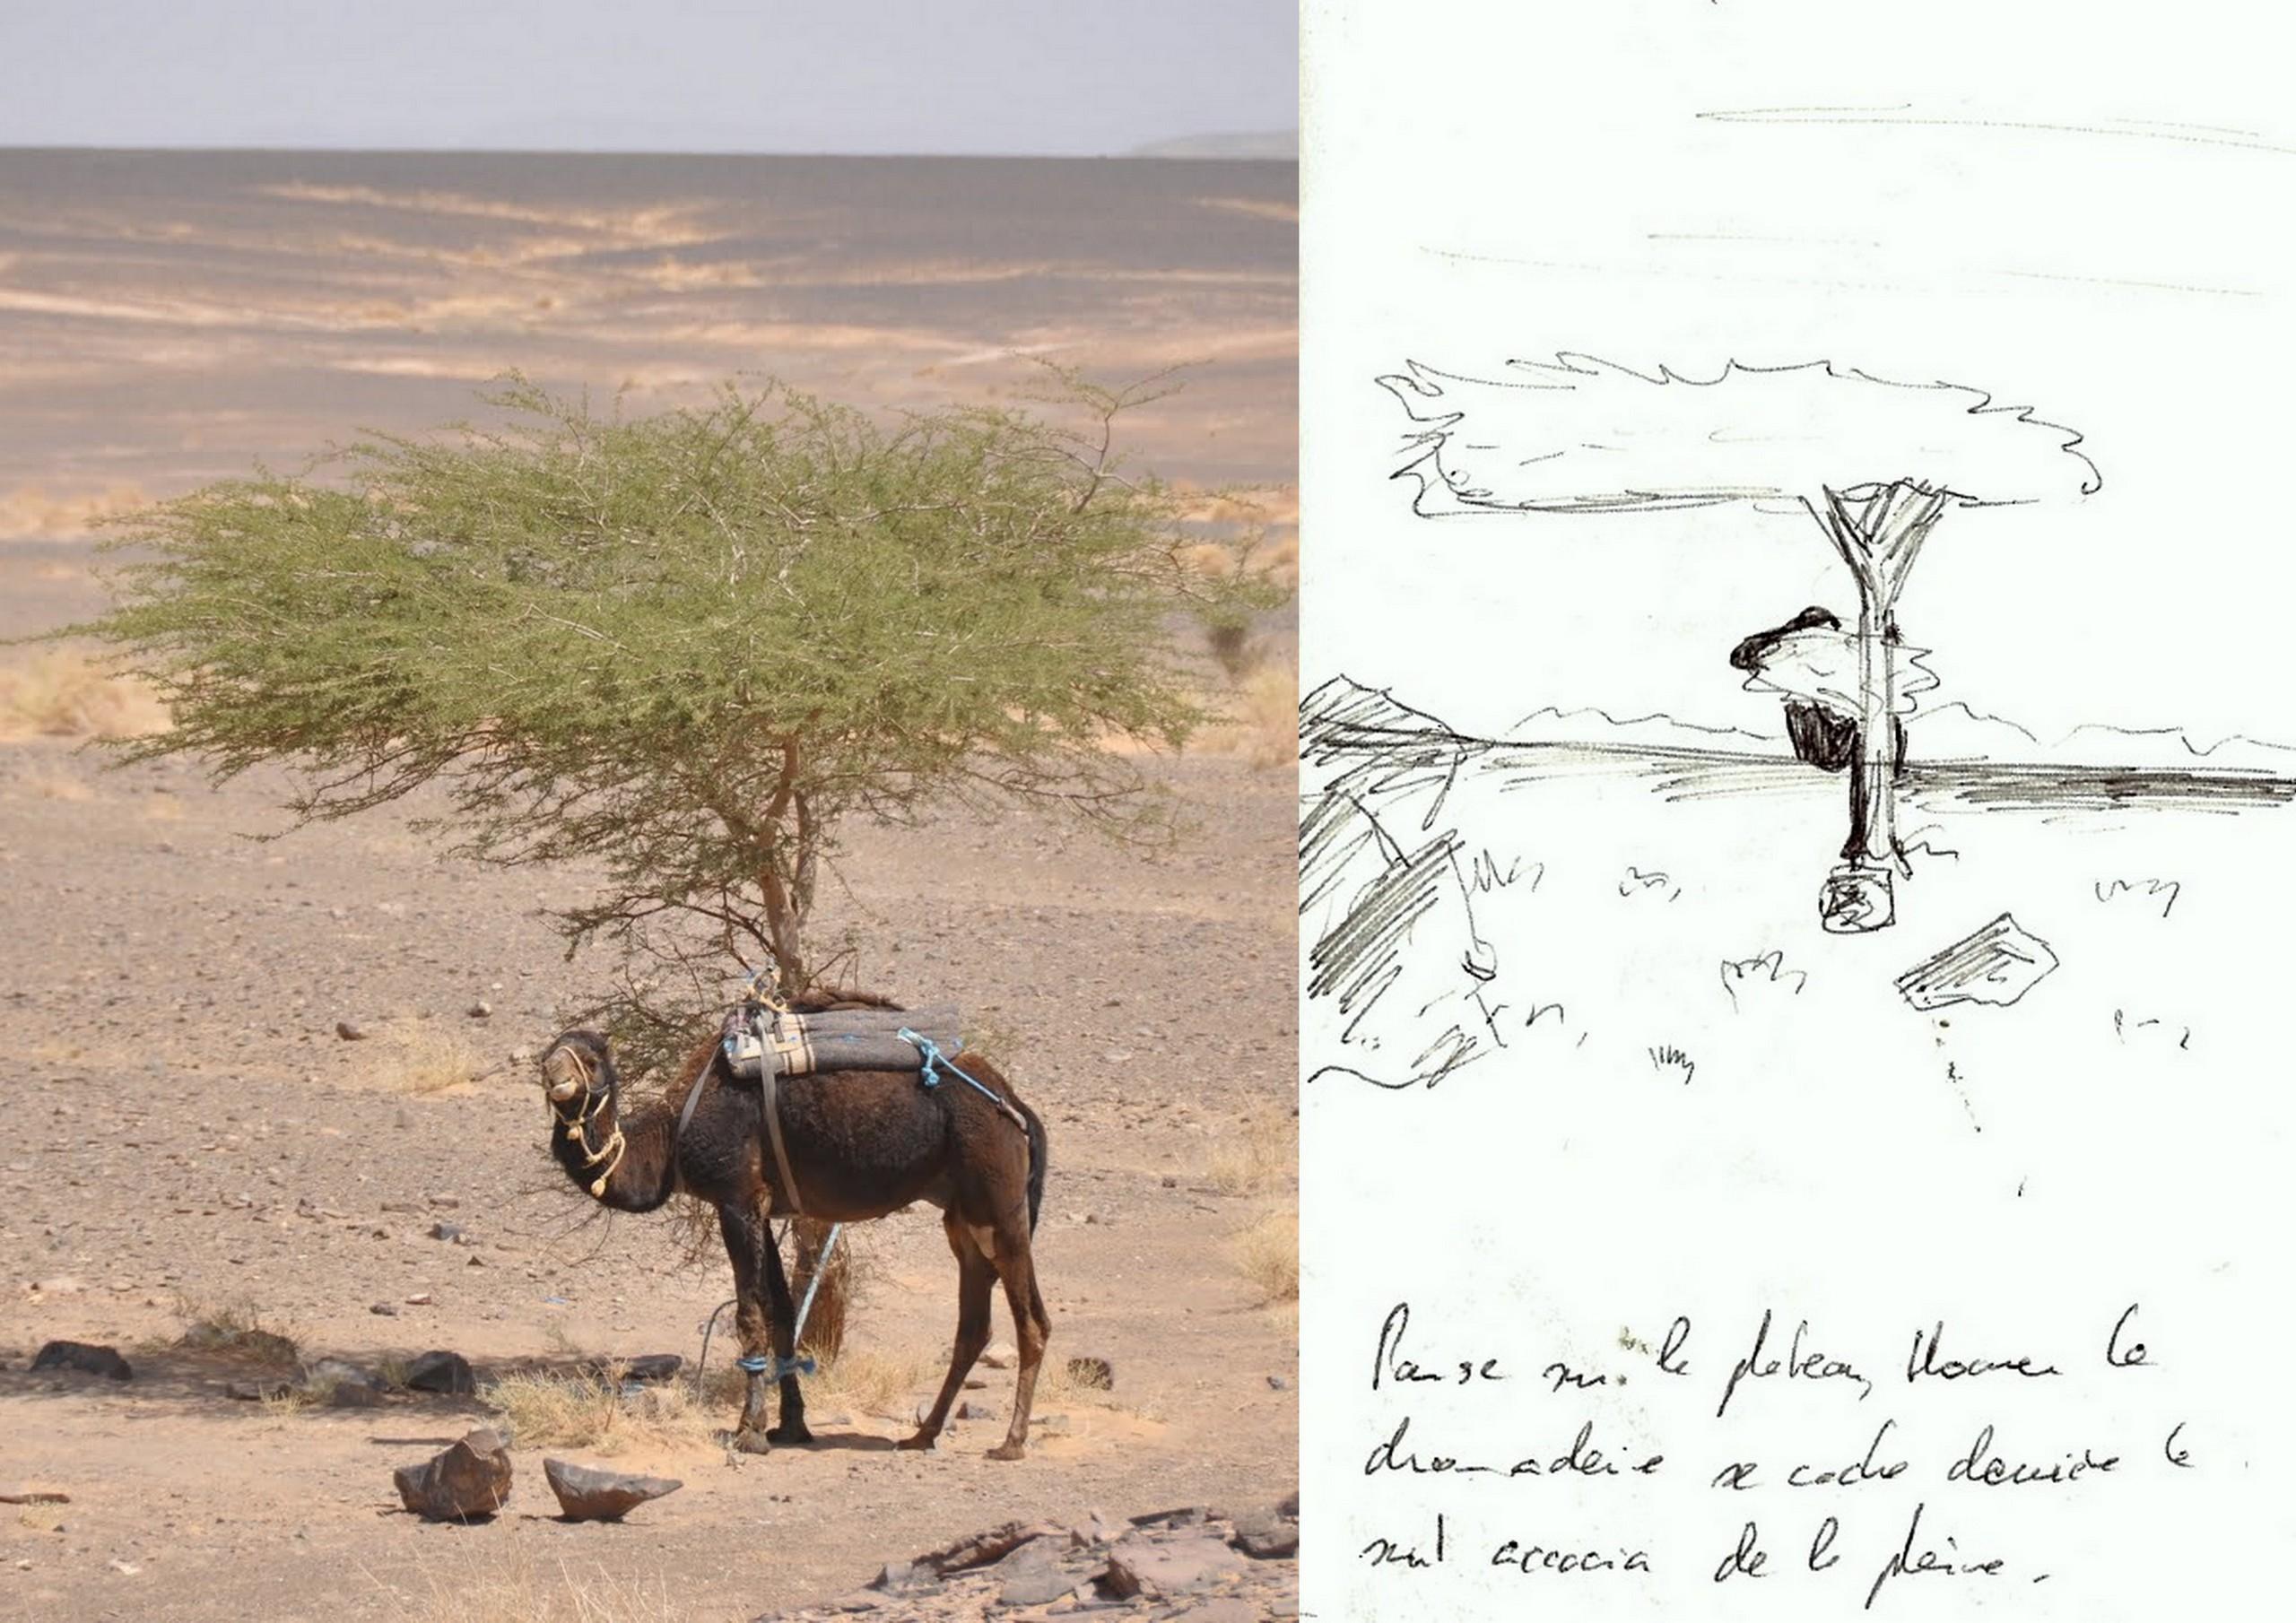 Maroc - Dunes de Merzouga - Avril 2012